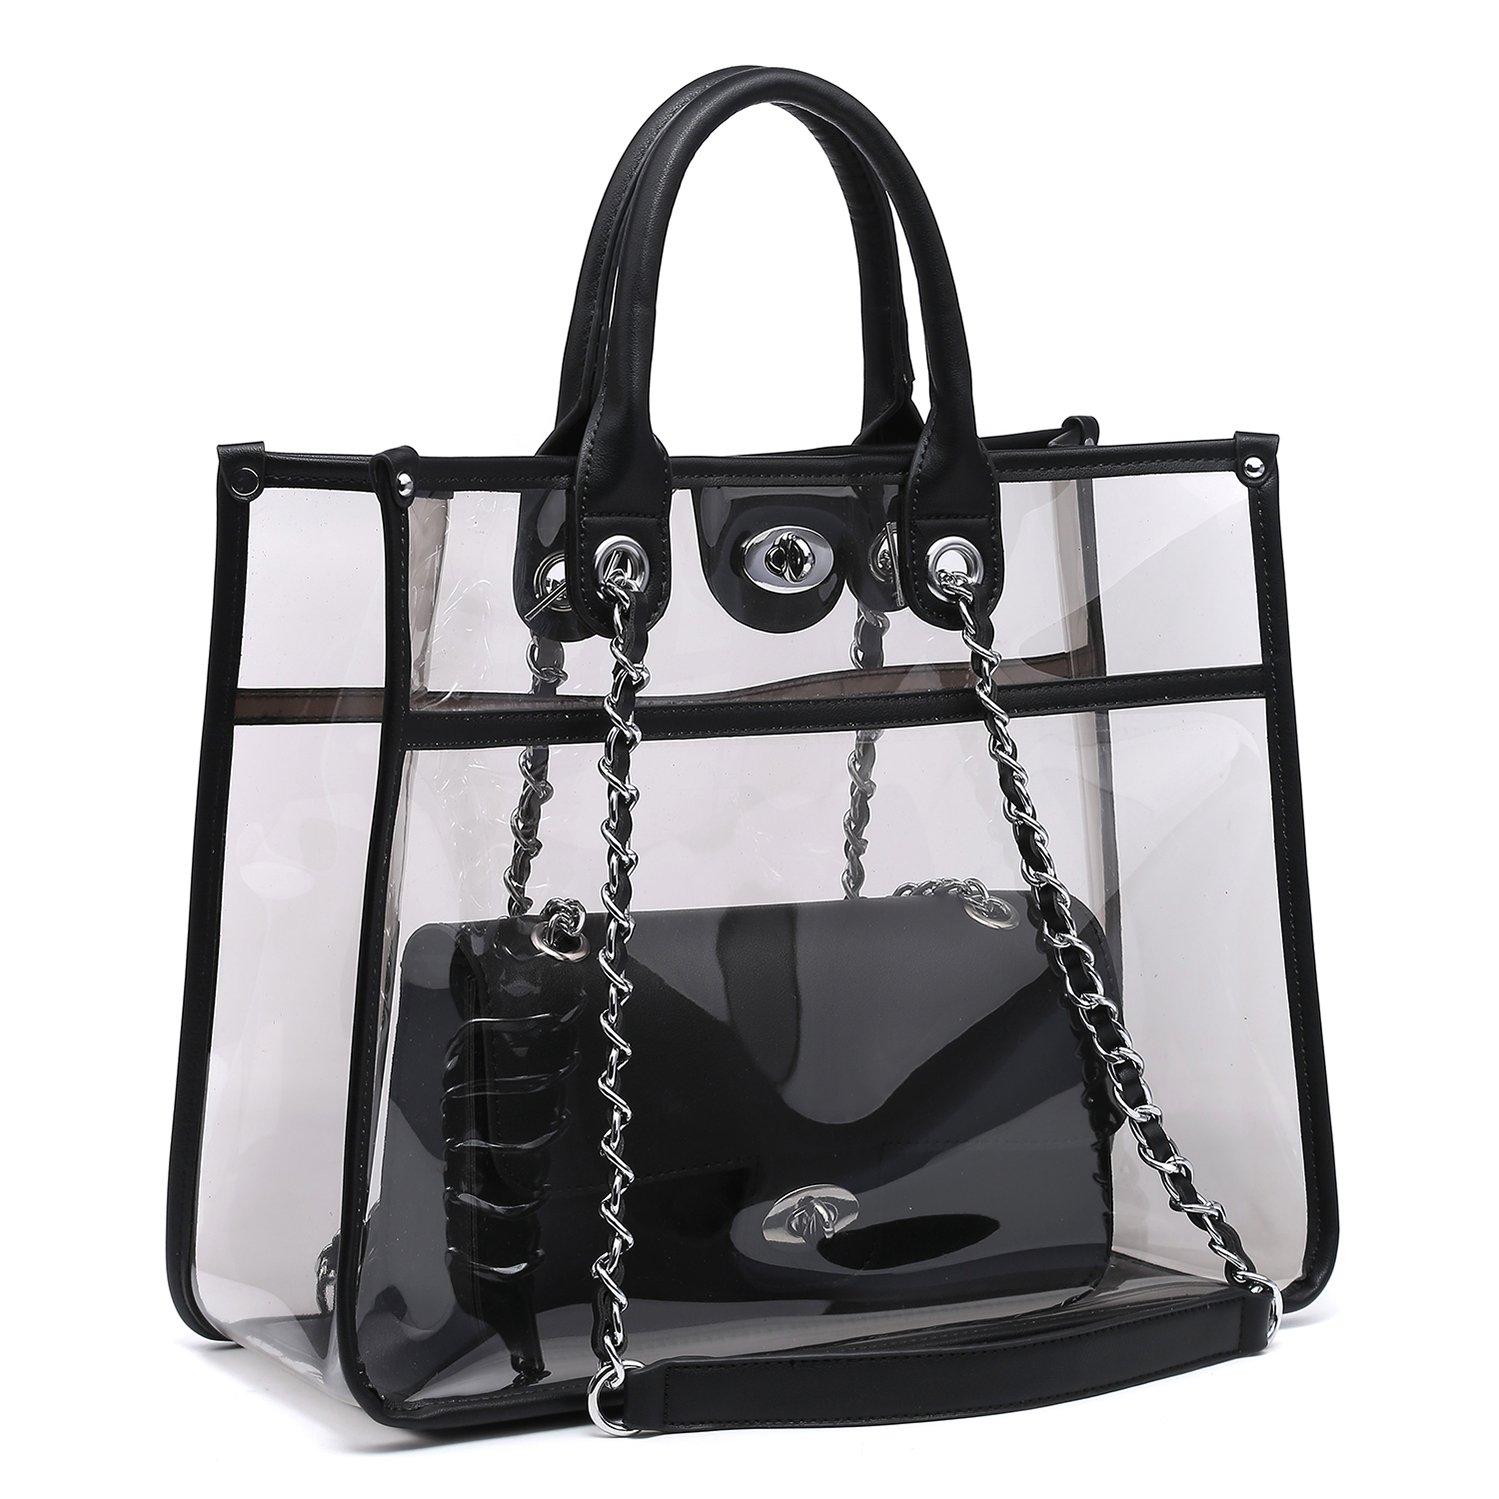 Large Clear PVC Top Handle Shoulder Bag Tote Handbag 2 Piece Set Leather Crossbody Purse Black